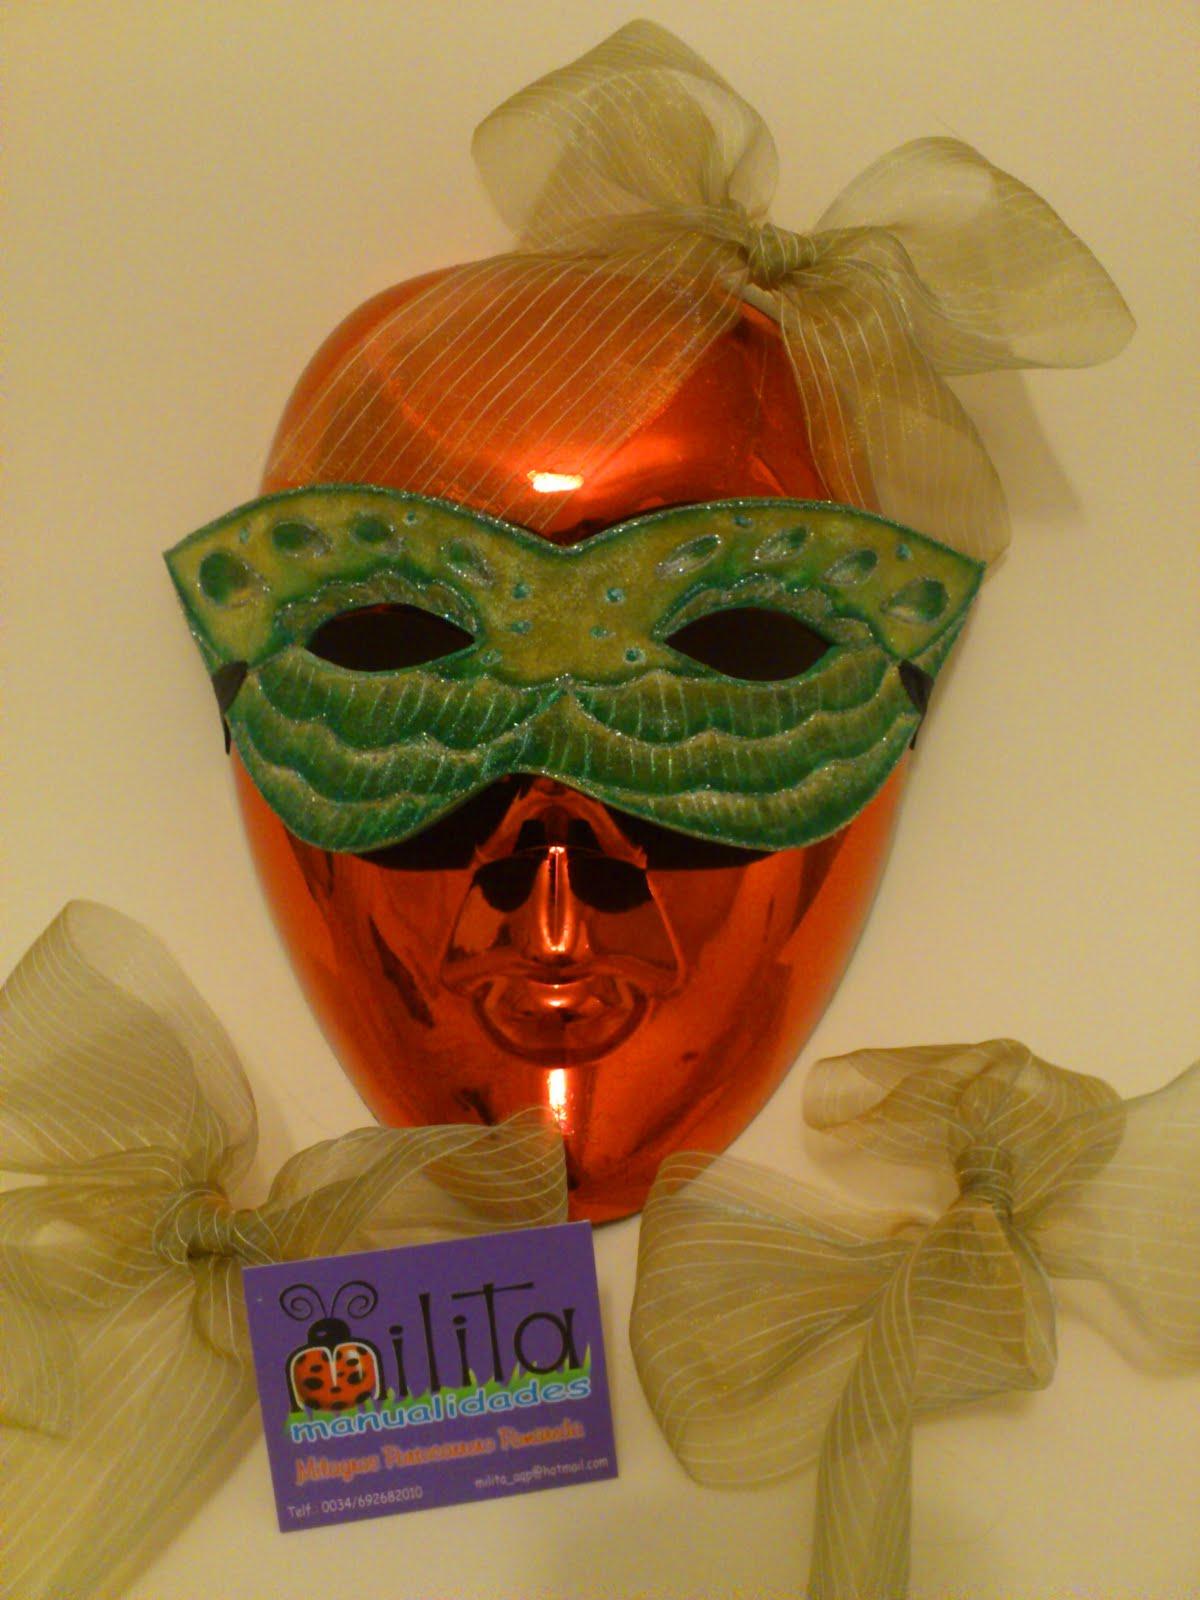 Milita manualidades mascaras para carnaval - Mascaras para carnaval manualidades ...